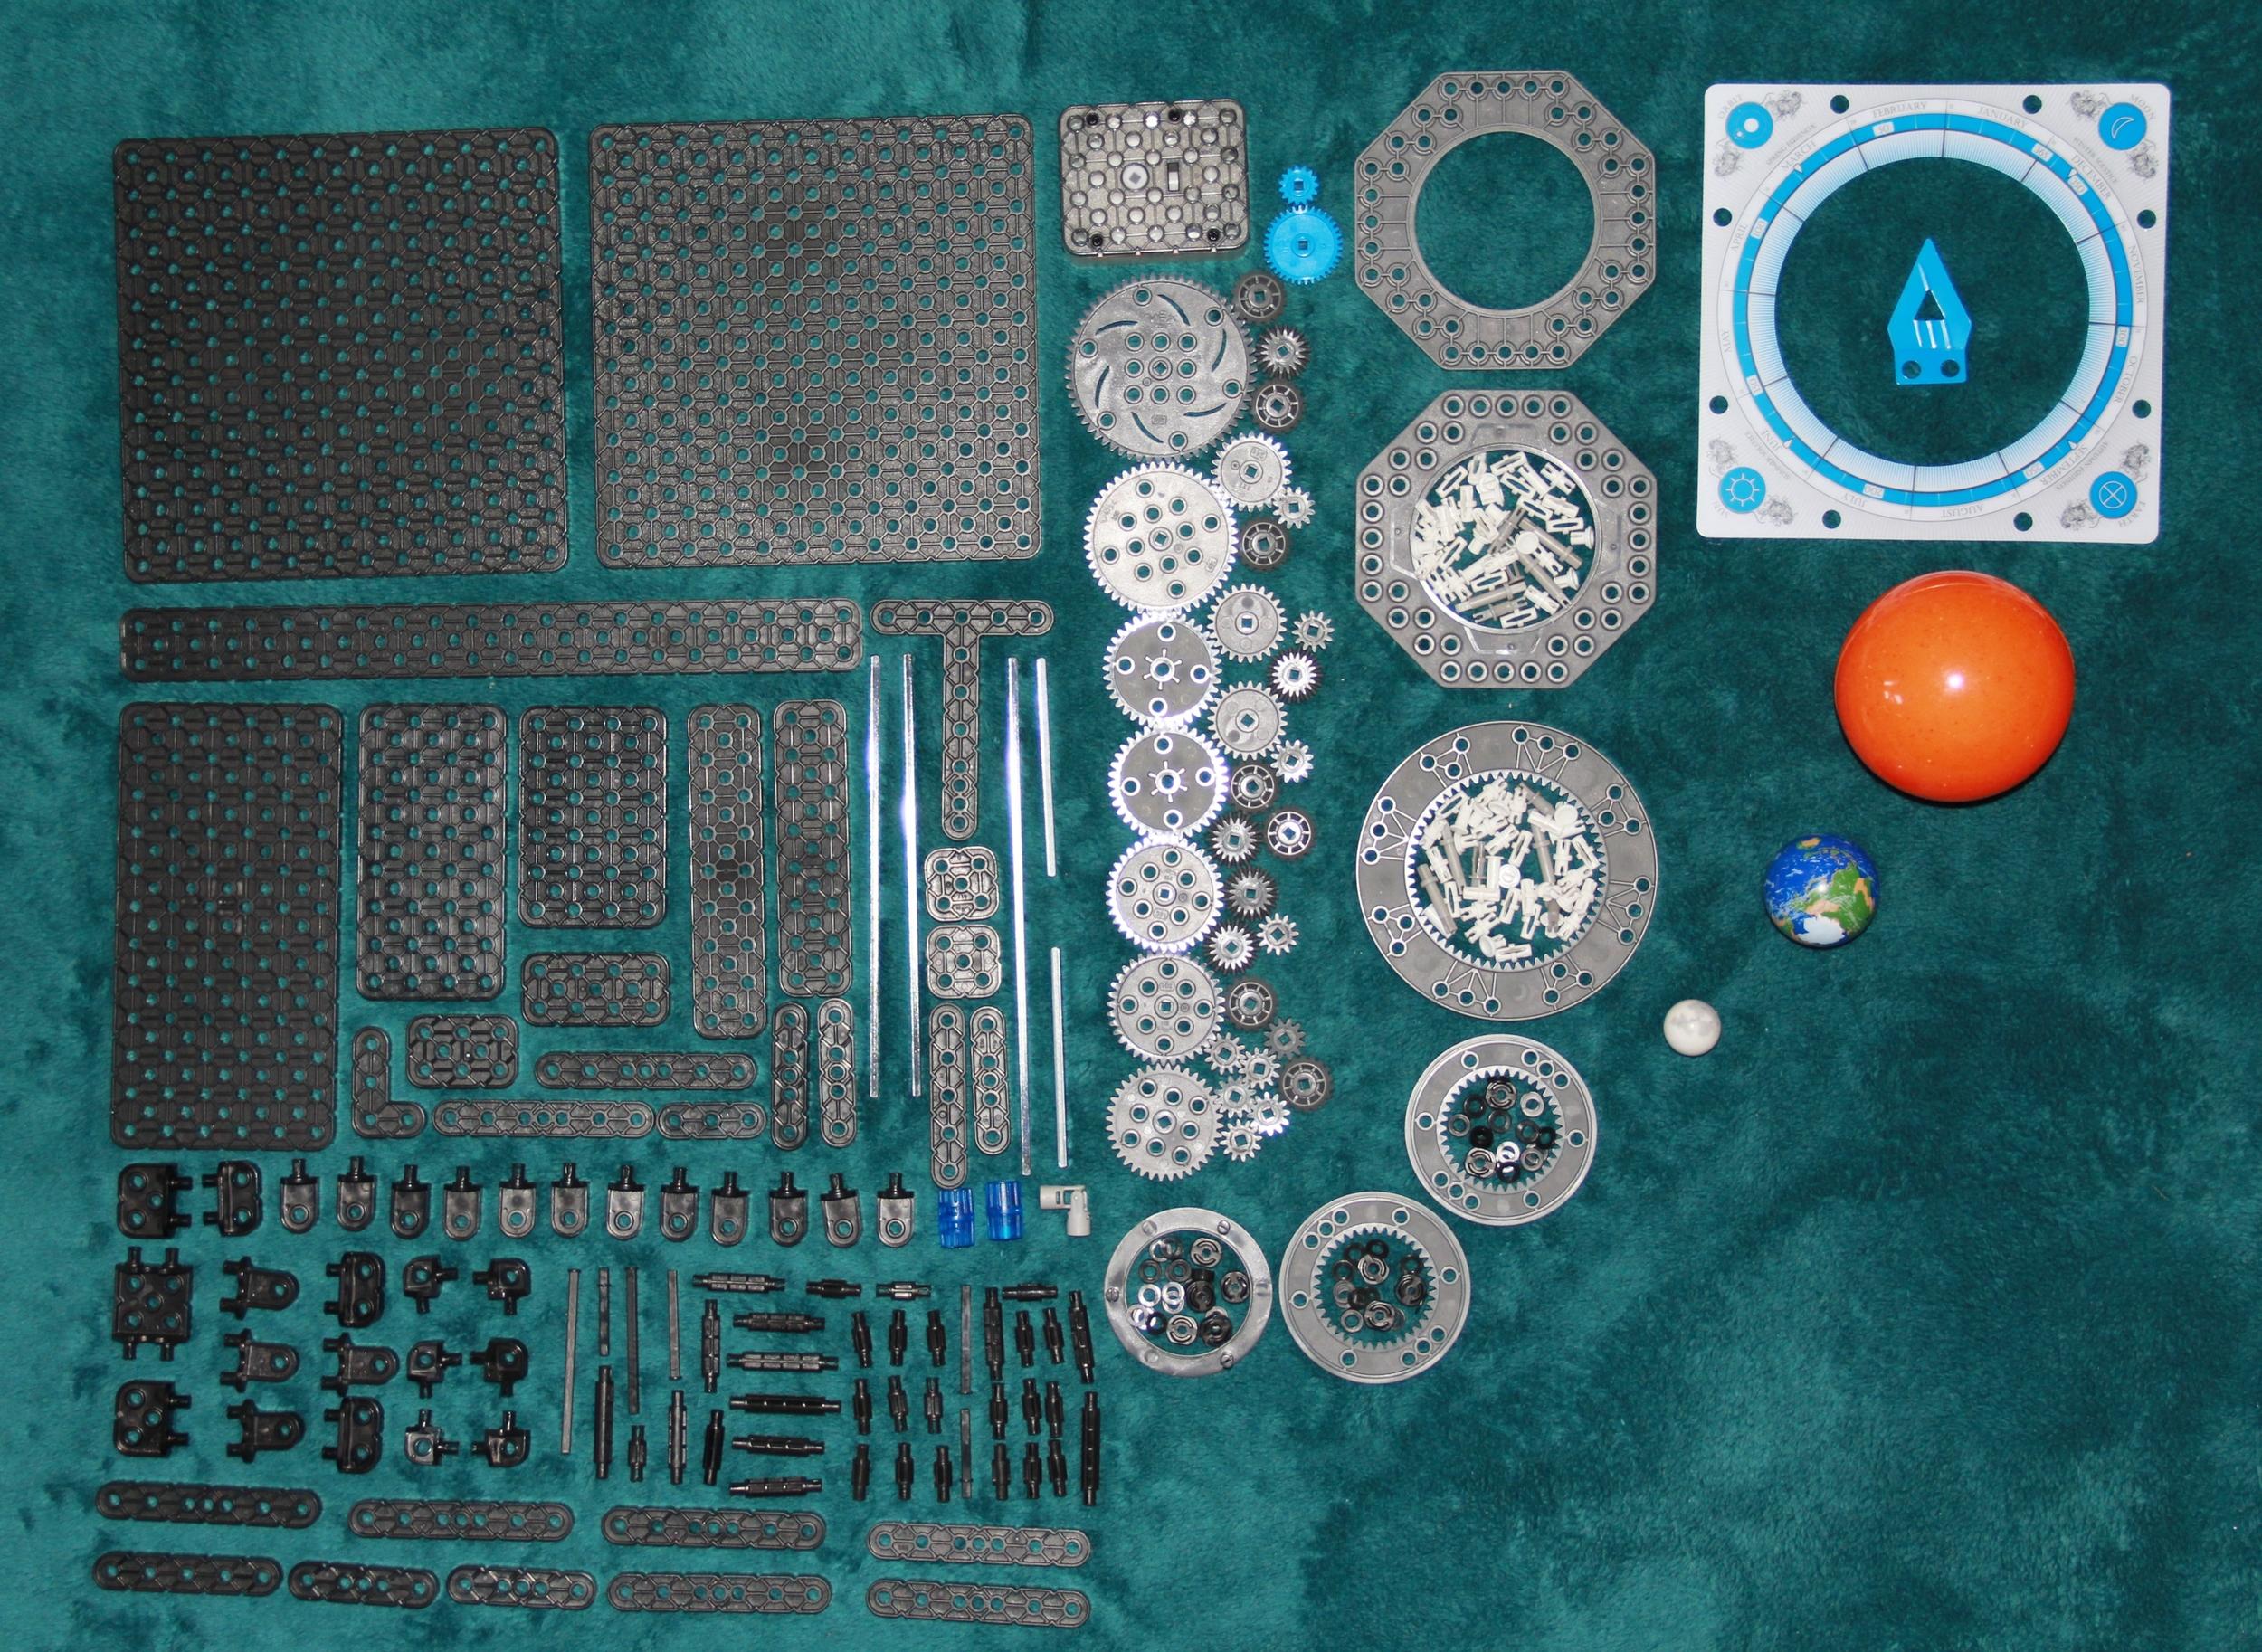 All of the pieces in the VEX Robotics Orbit Kit